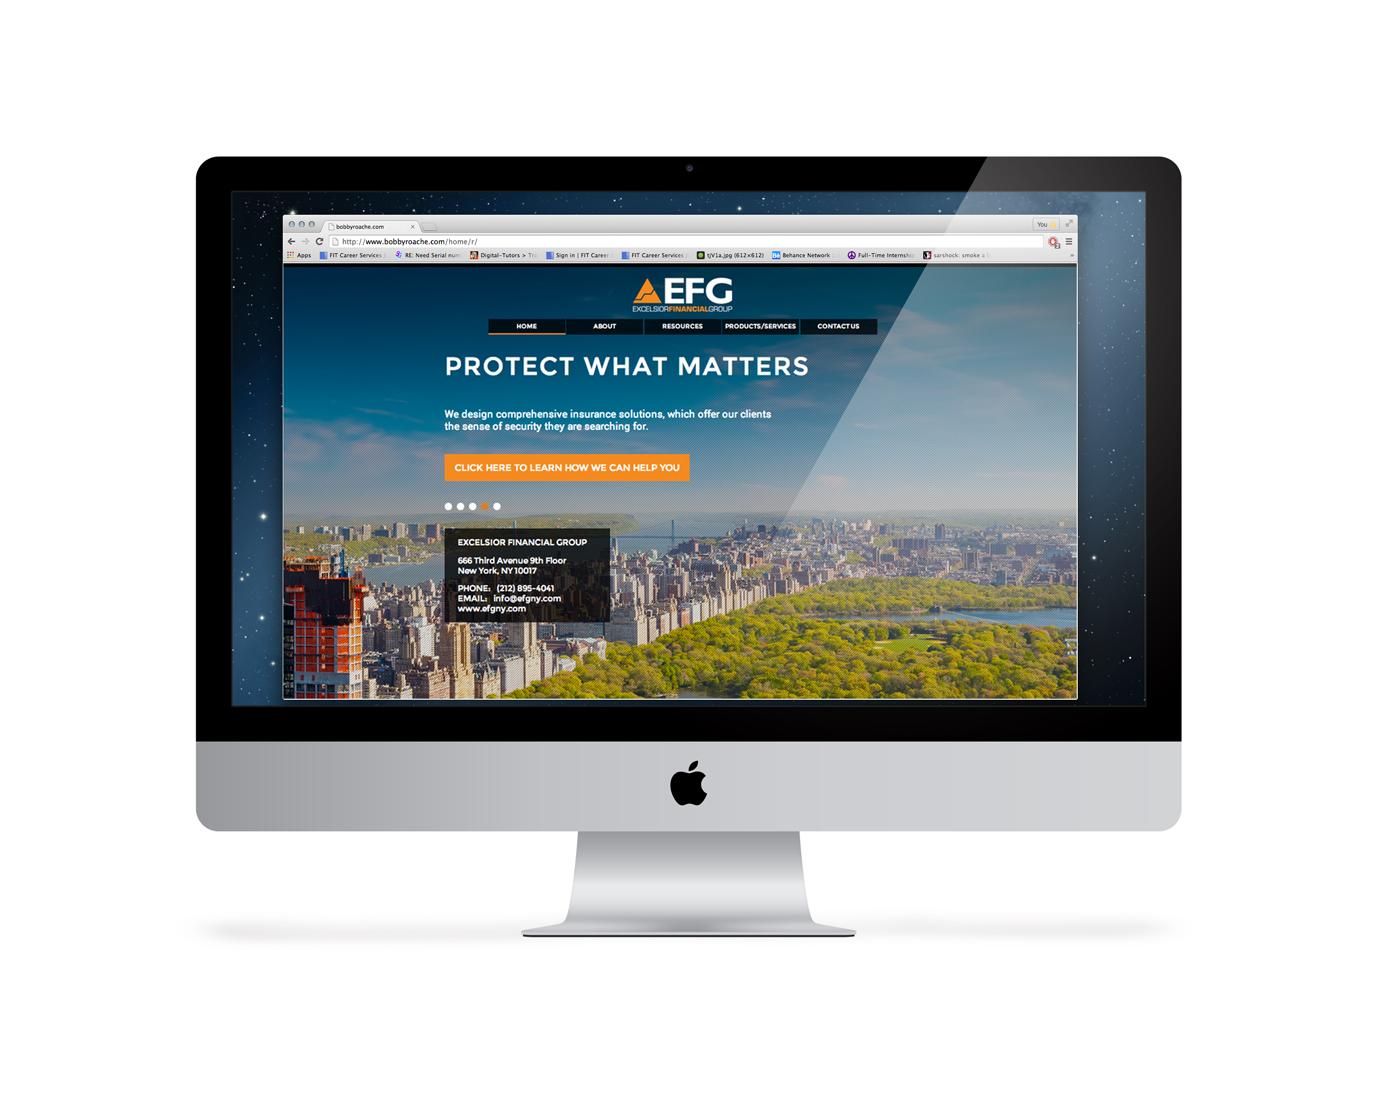 imac_desktop_EFG.jpg